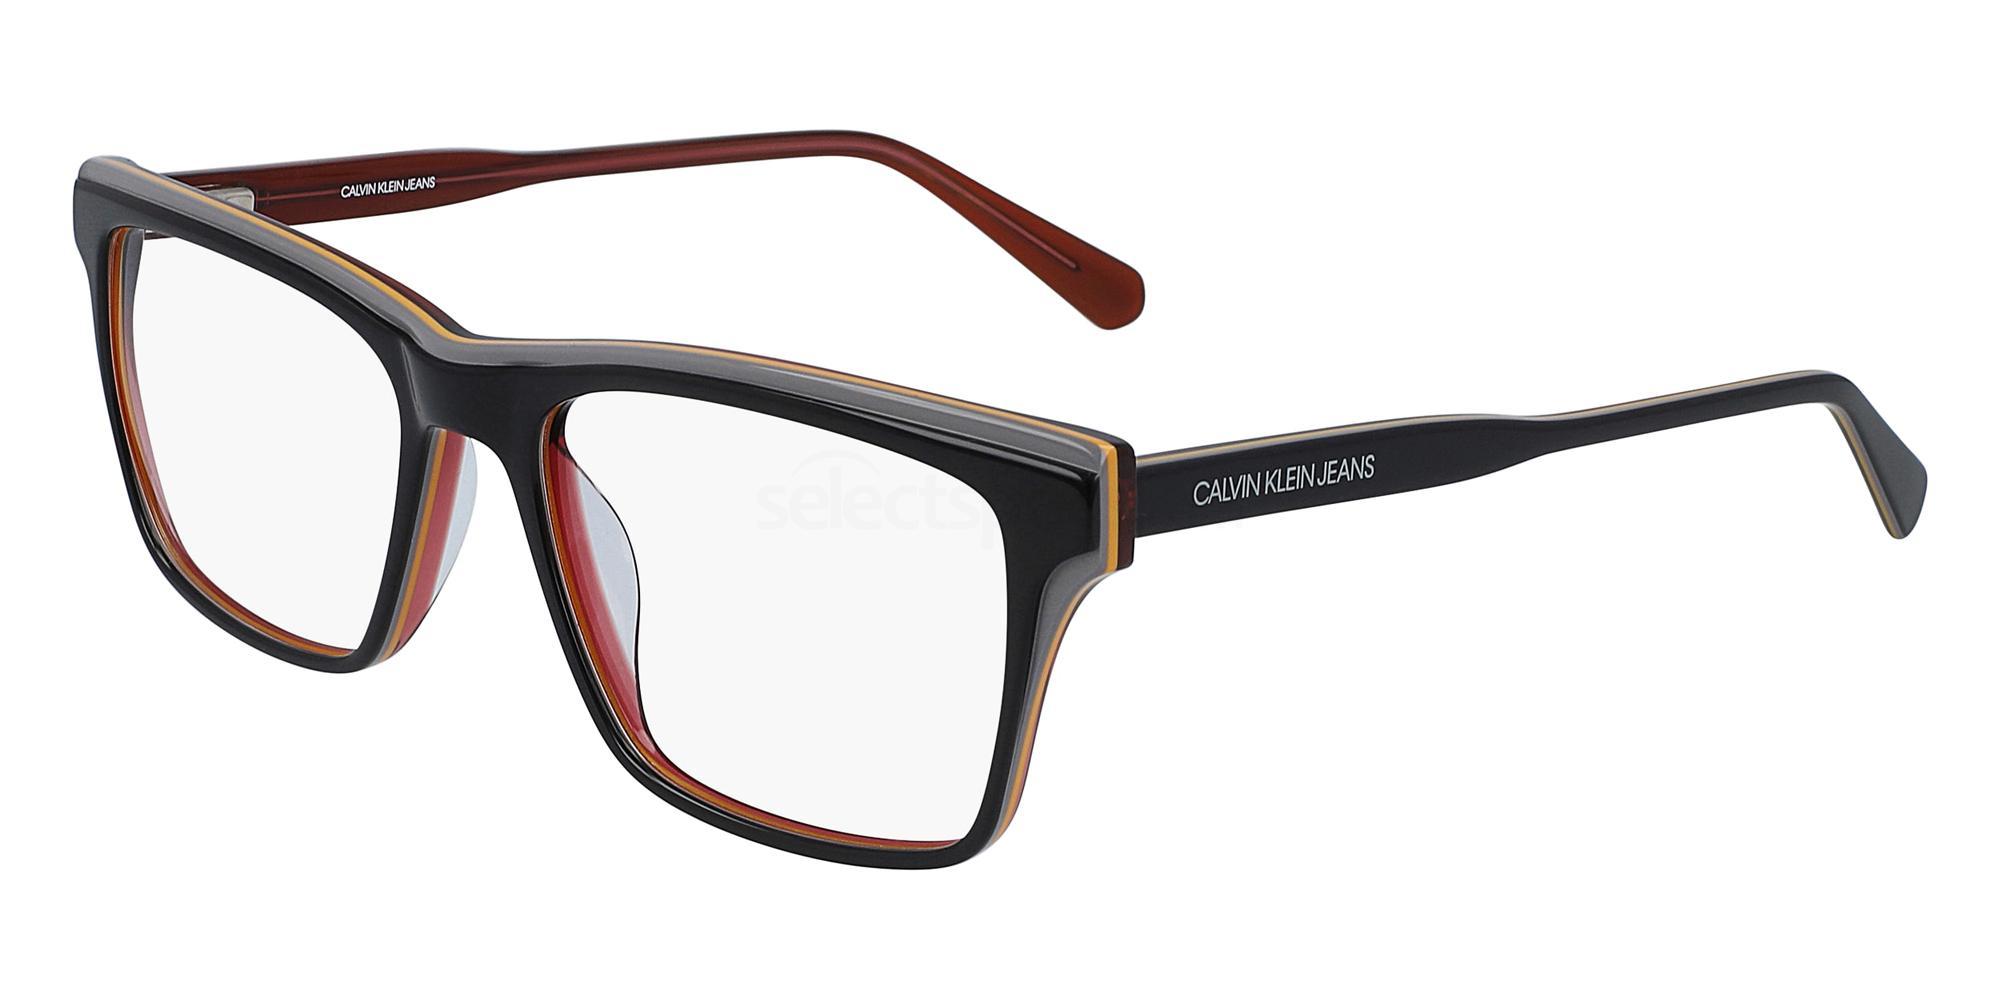 074 CKJ19512 Glasses, Calvin Klein Jeans